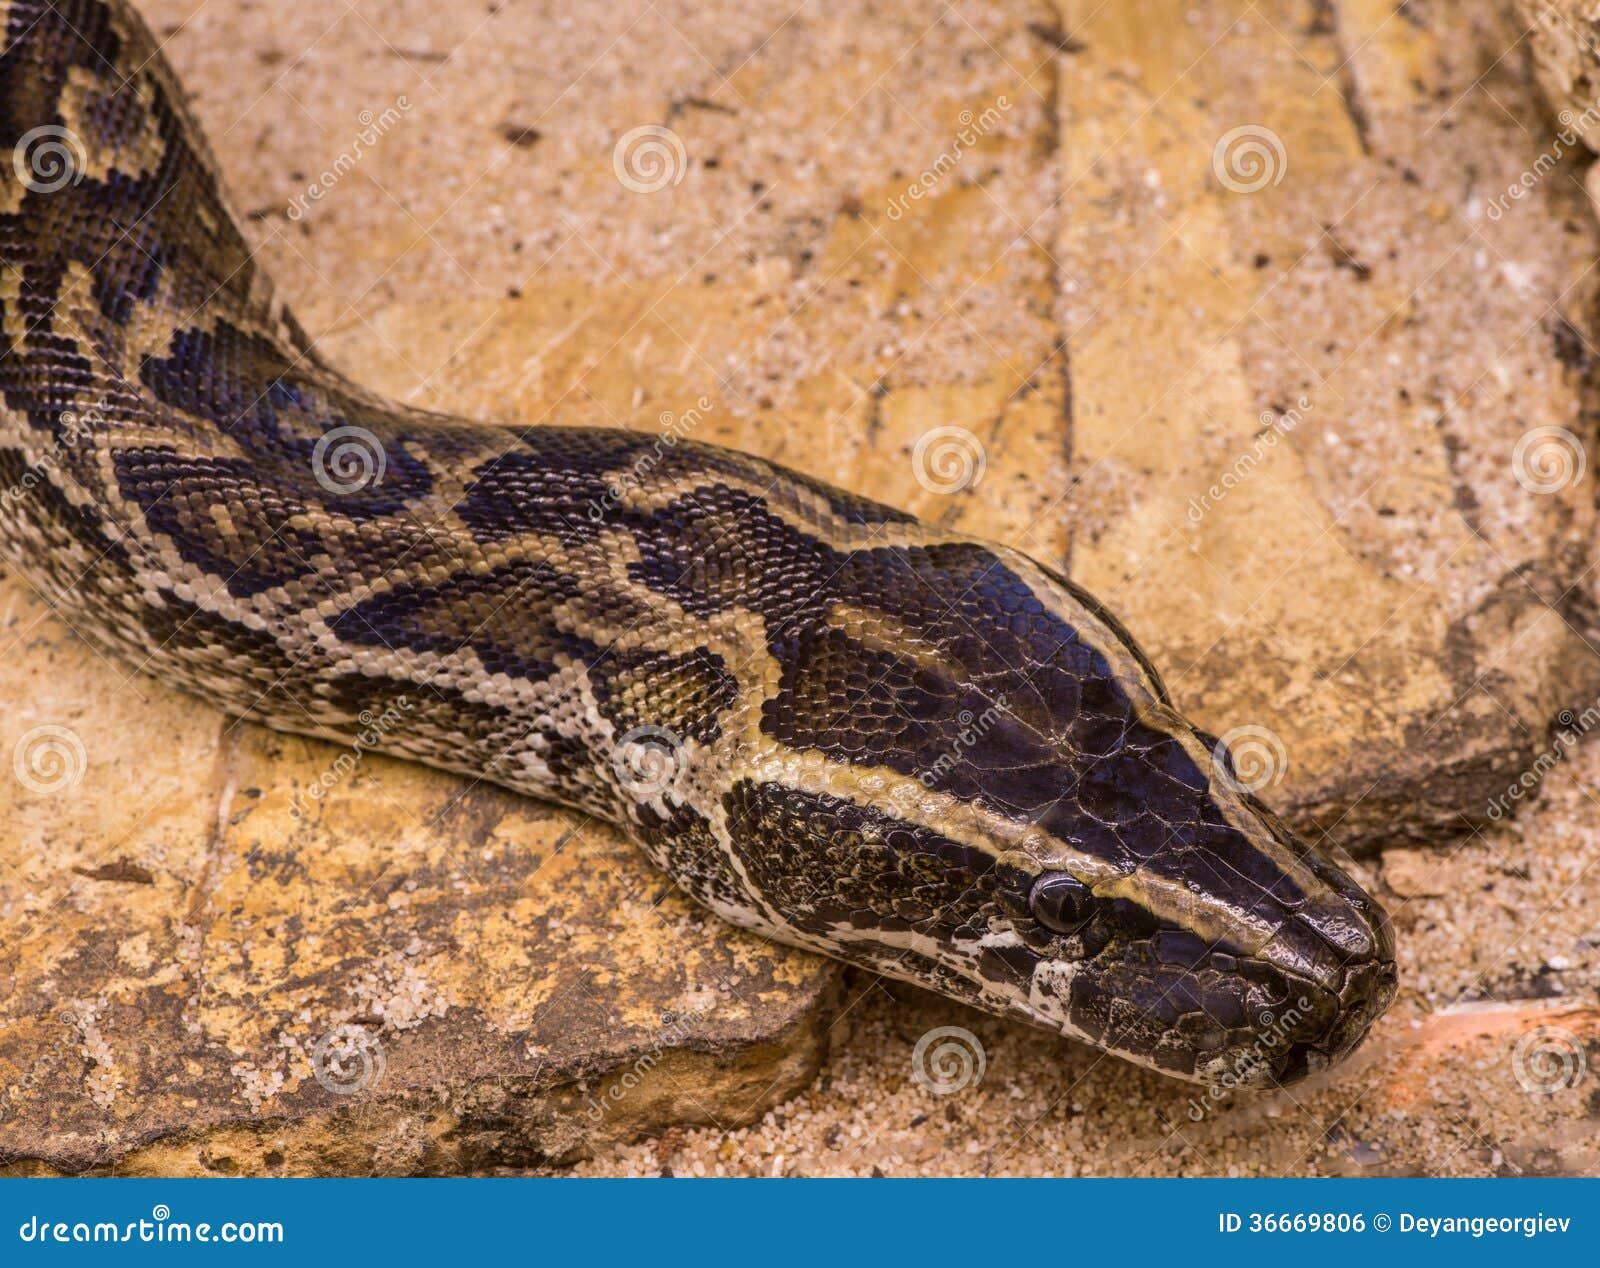 Chicken snake stock photo. Image of animals, snake, fauna ...